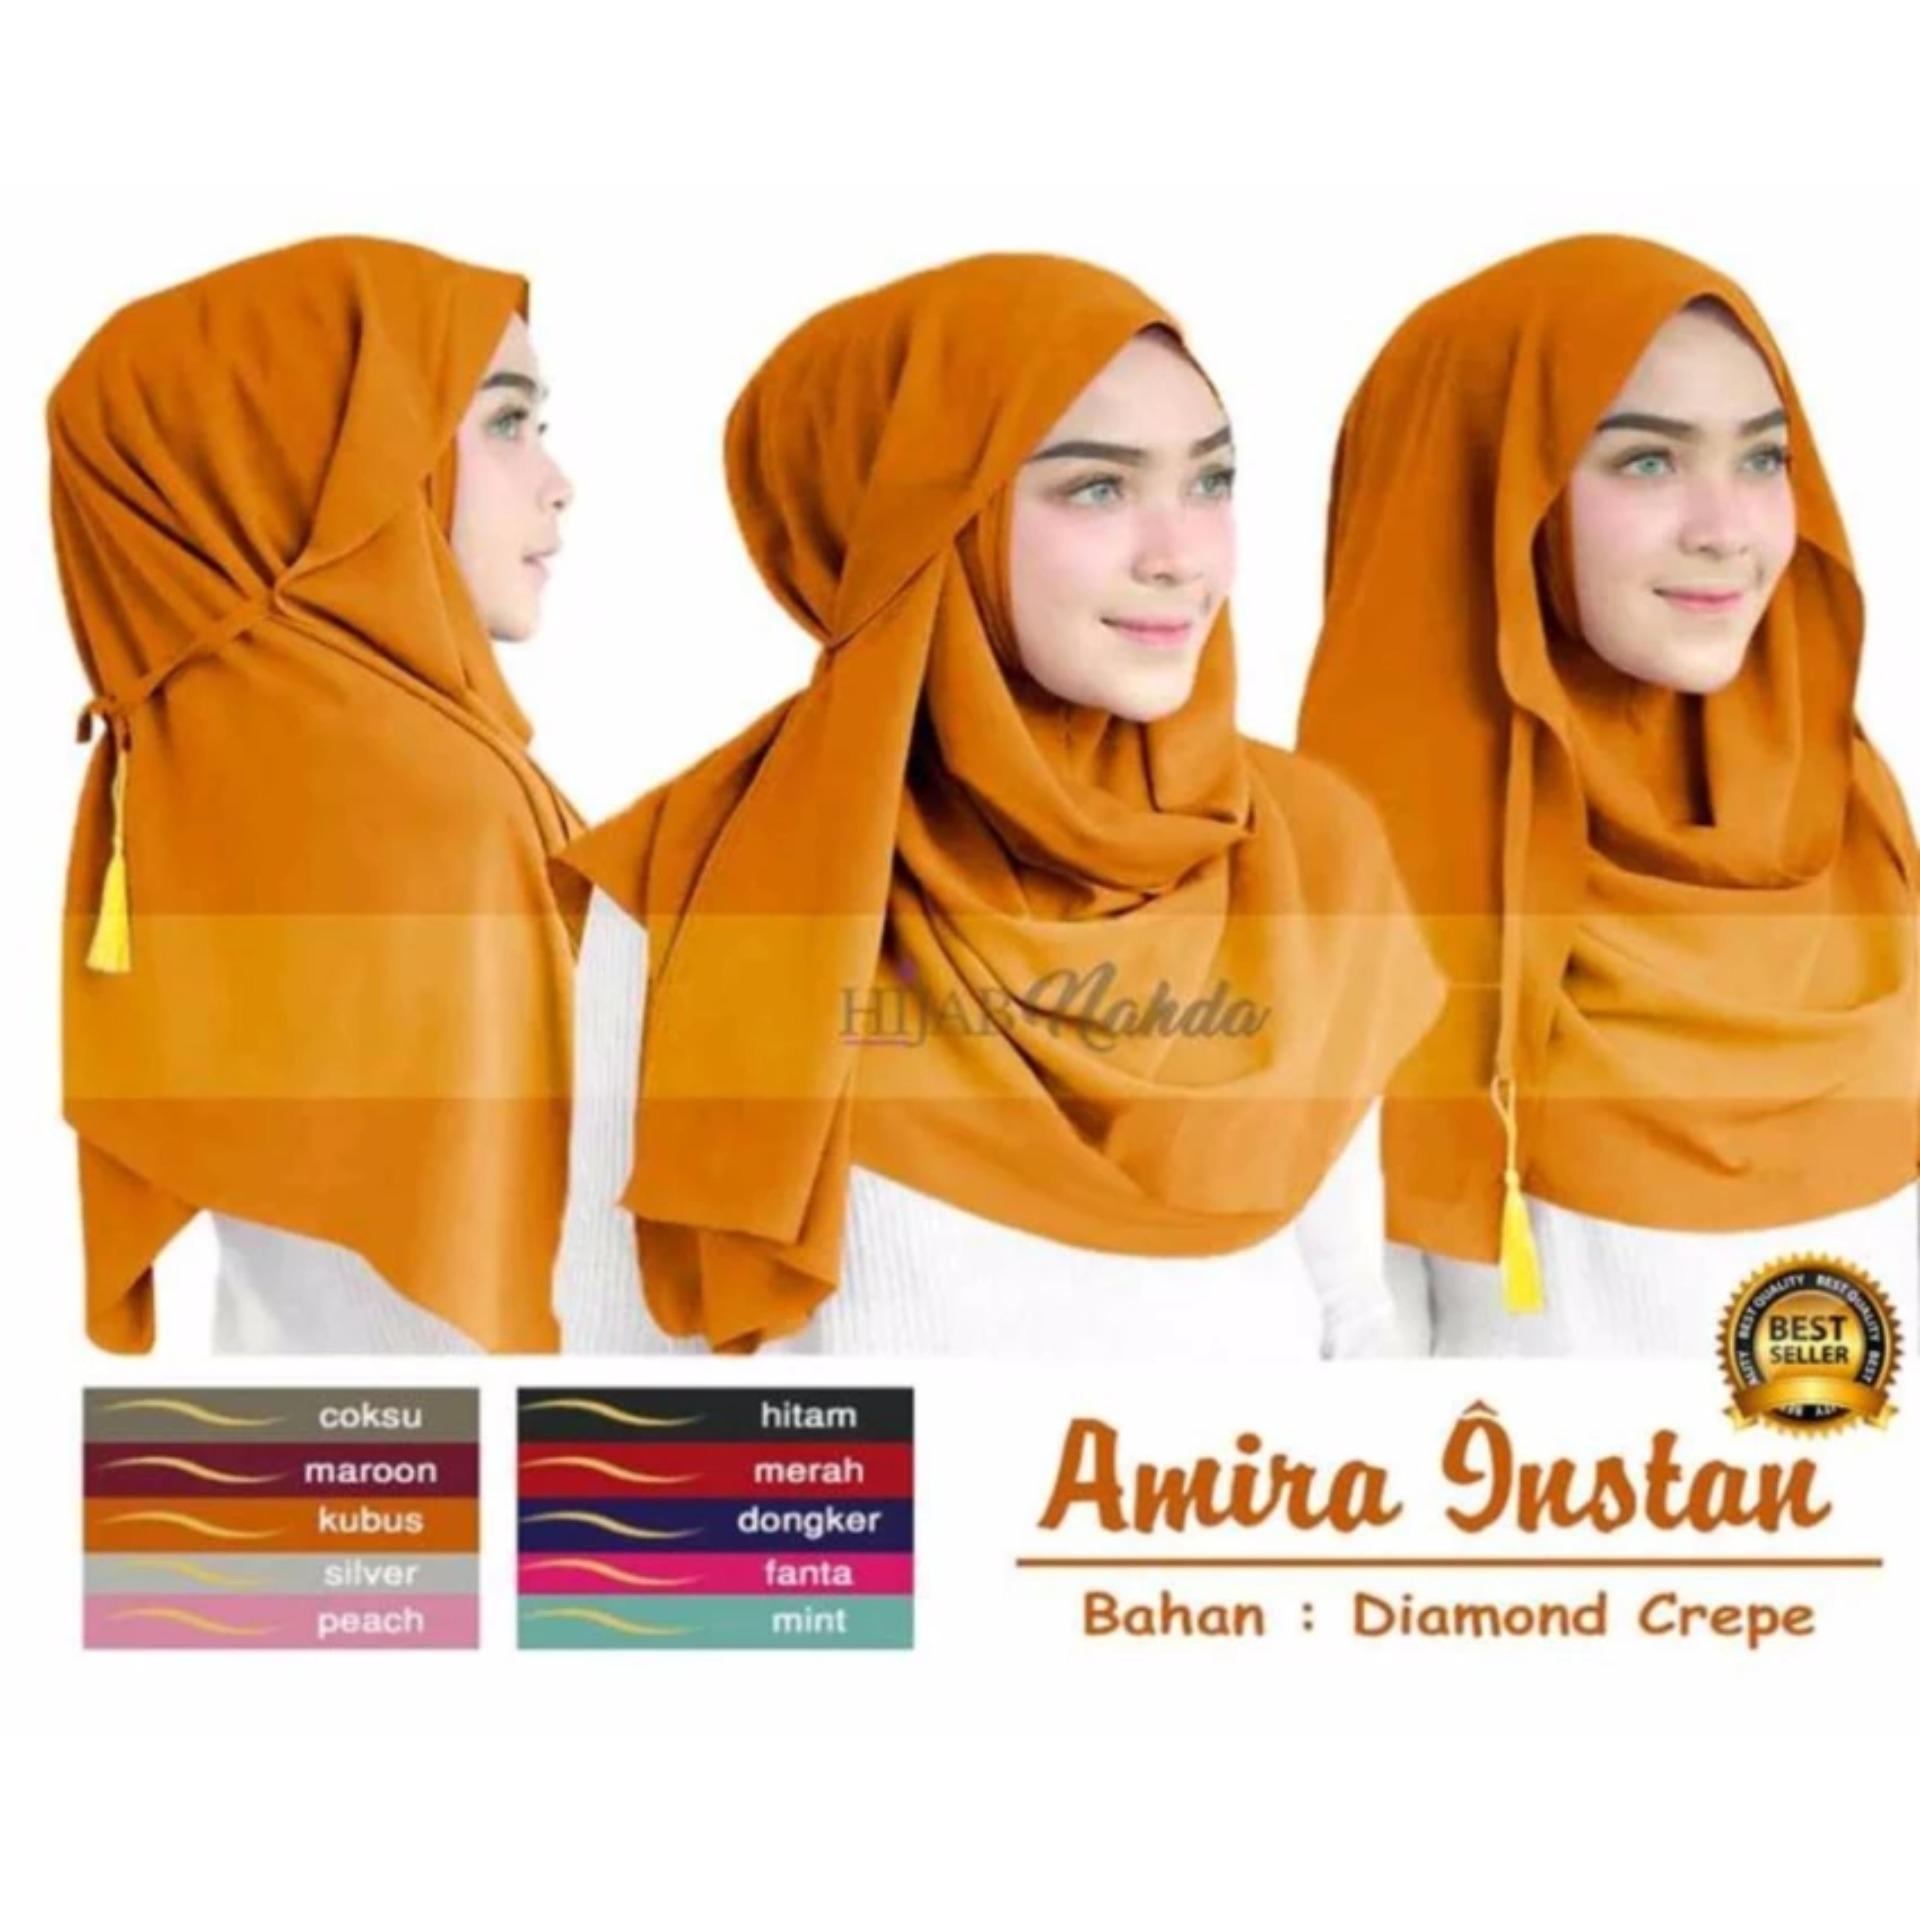 Premium Jilbab (Hijab) Kerudung Instant Pashmina 3in1 Amira